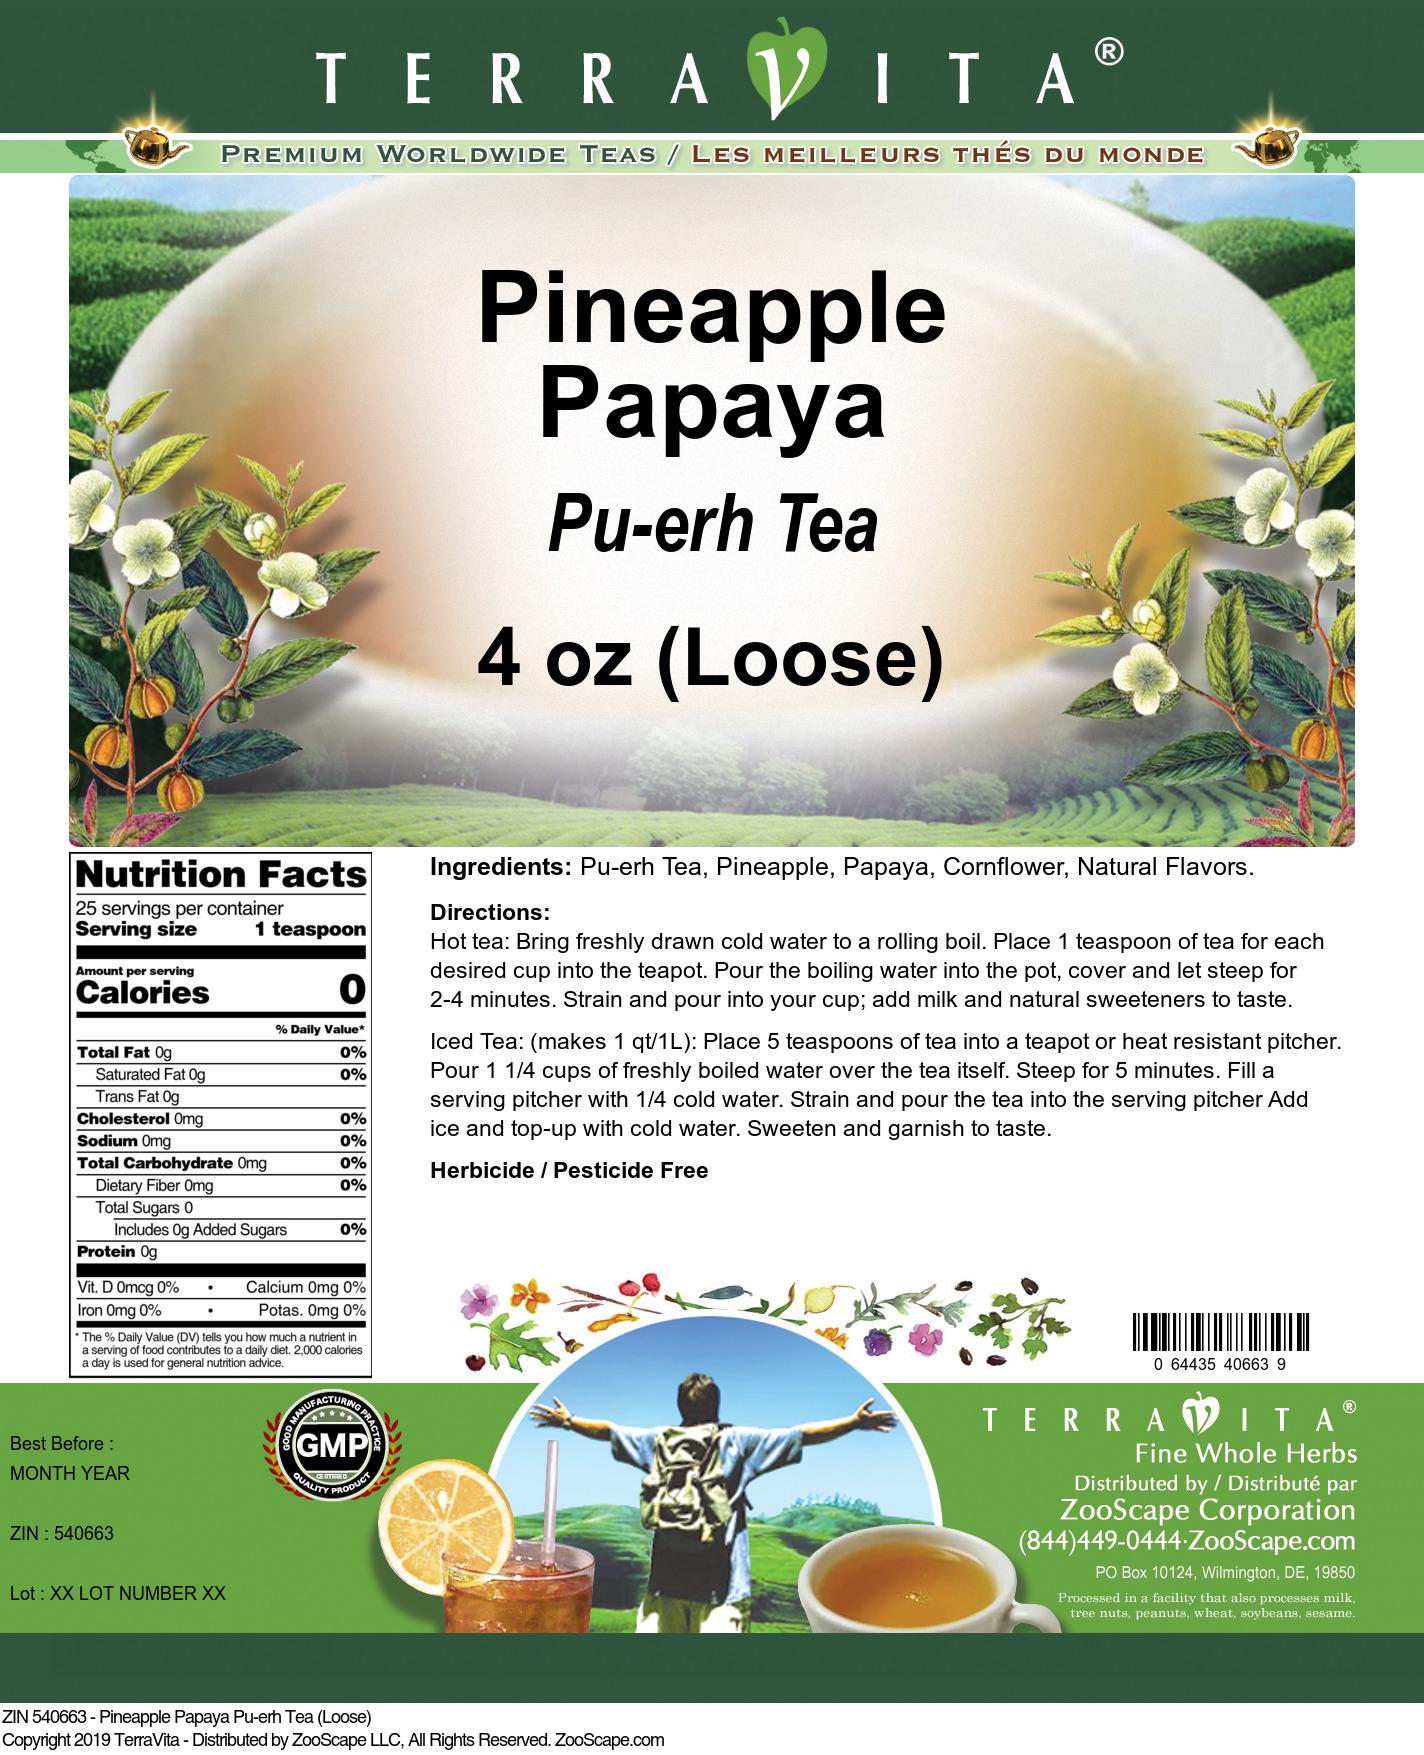 Pineapple Papaya Pu-erh Tea (Loose)